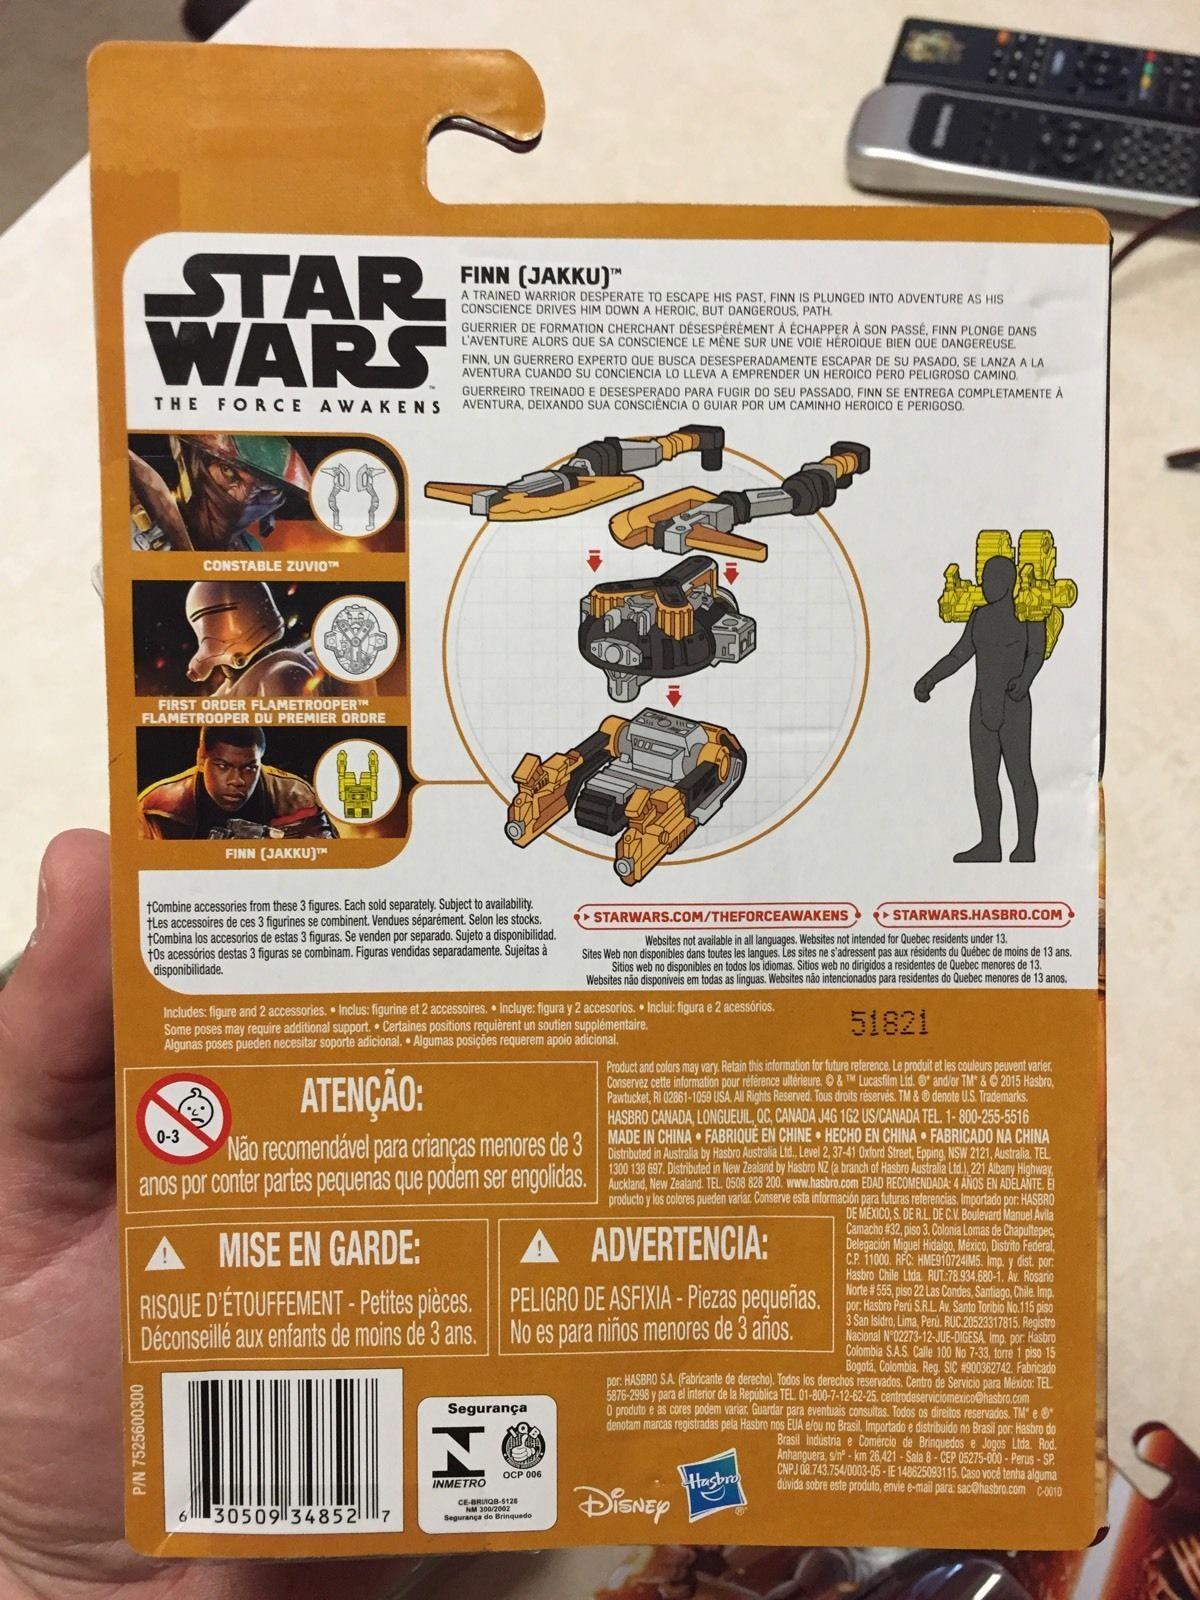 Boyega Confirms Star Wars 8 Celebrity Cameos | ScreenRant